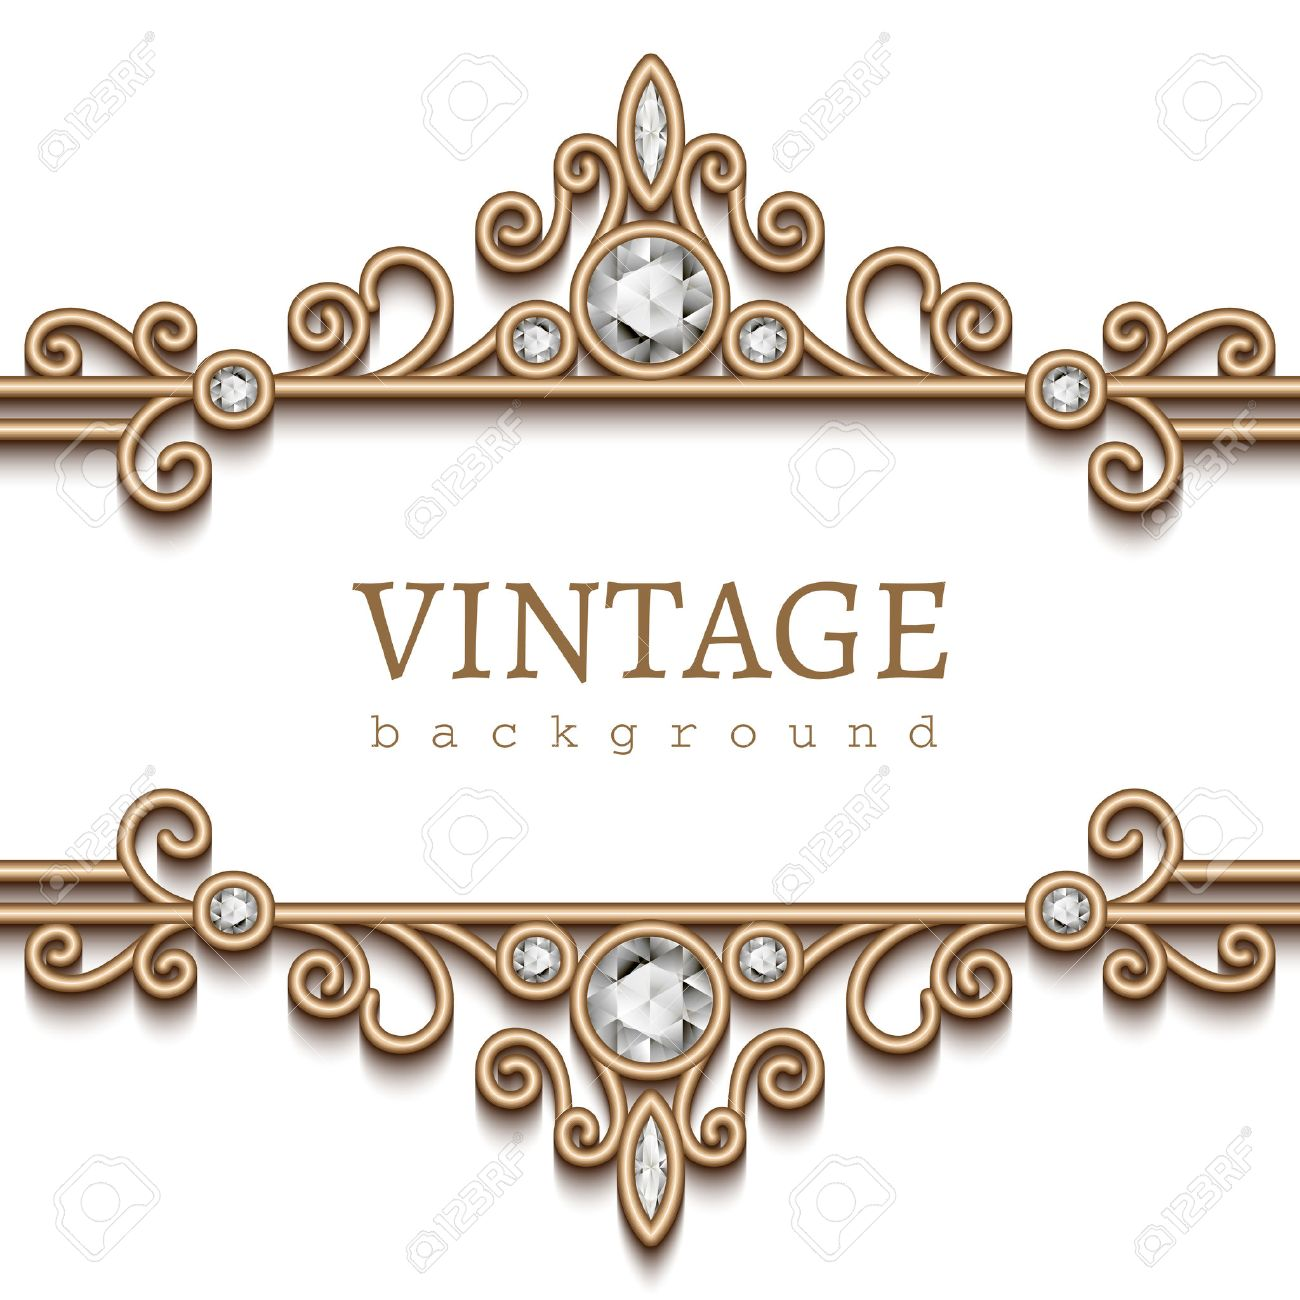 Vintage Gold Frame On White Divider Header Decorative Jewelry